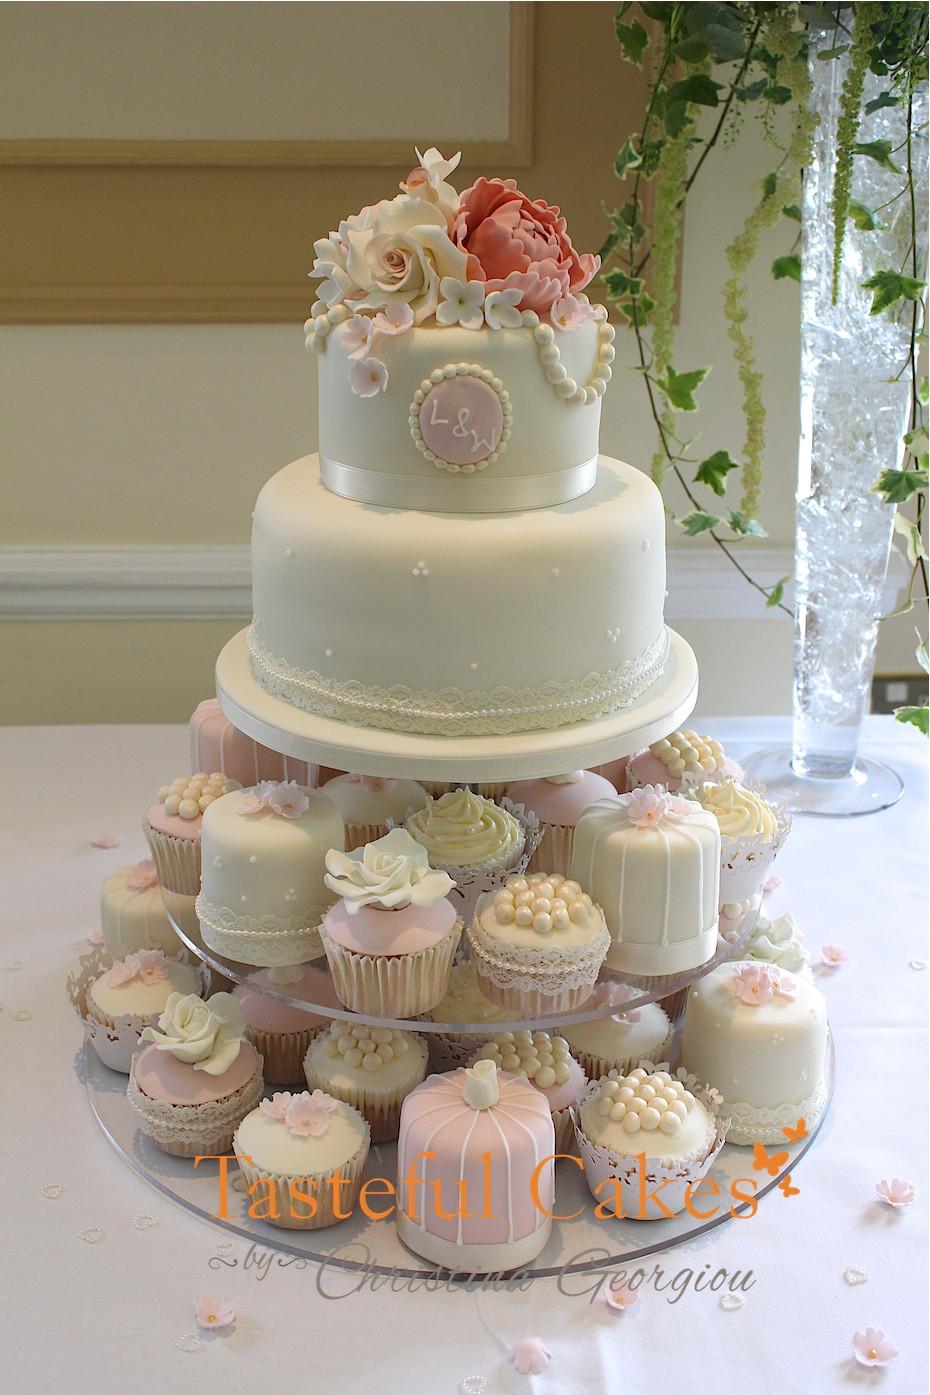 Wedding Cakes With Cupcakes  Tasteful Cakes By Christina Georgiou